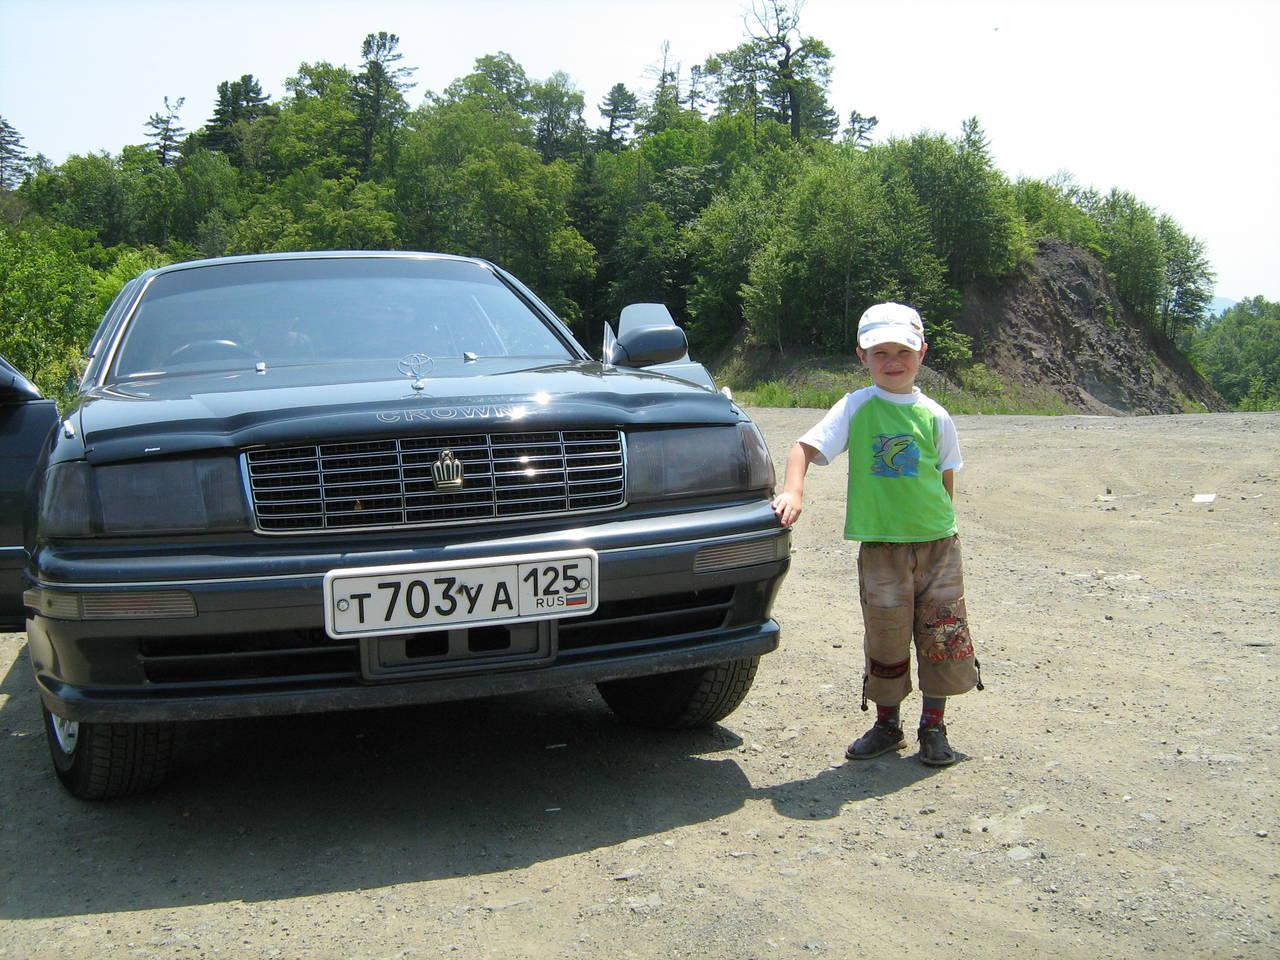 Авто ru иркутская область olx: http://rassvet-invest.ru/avto-ru-irkutskaya-oblast-olx.html